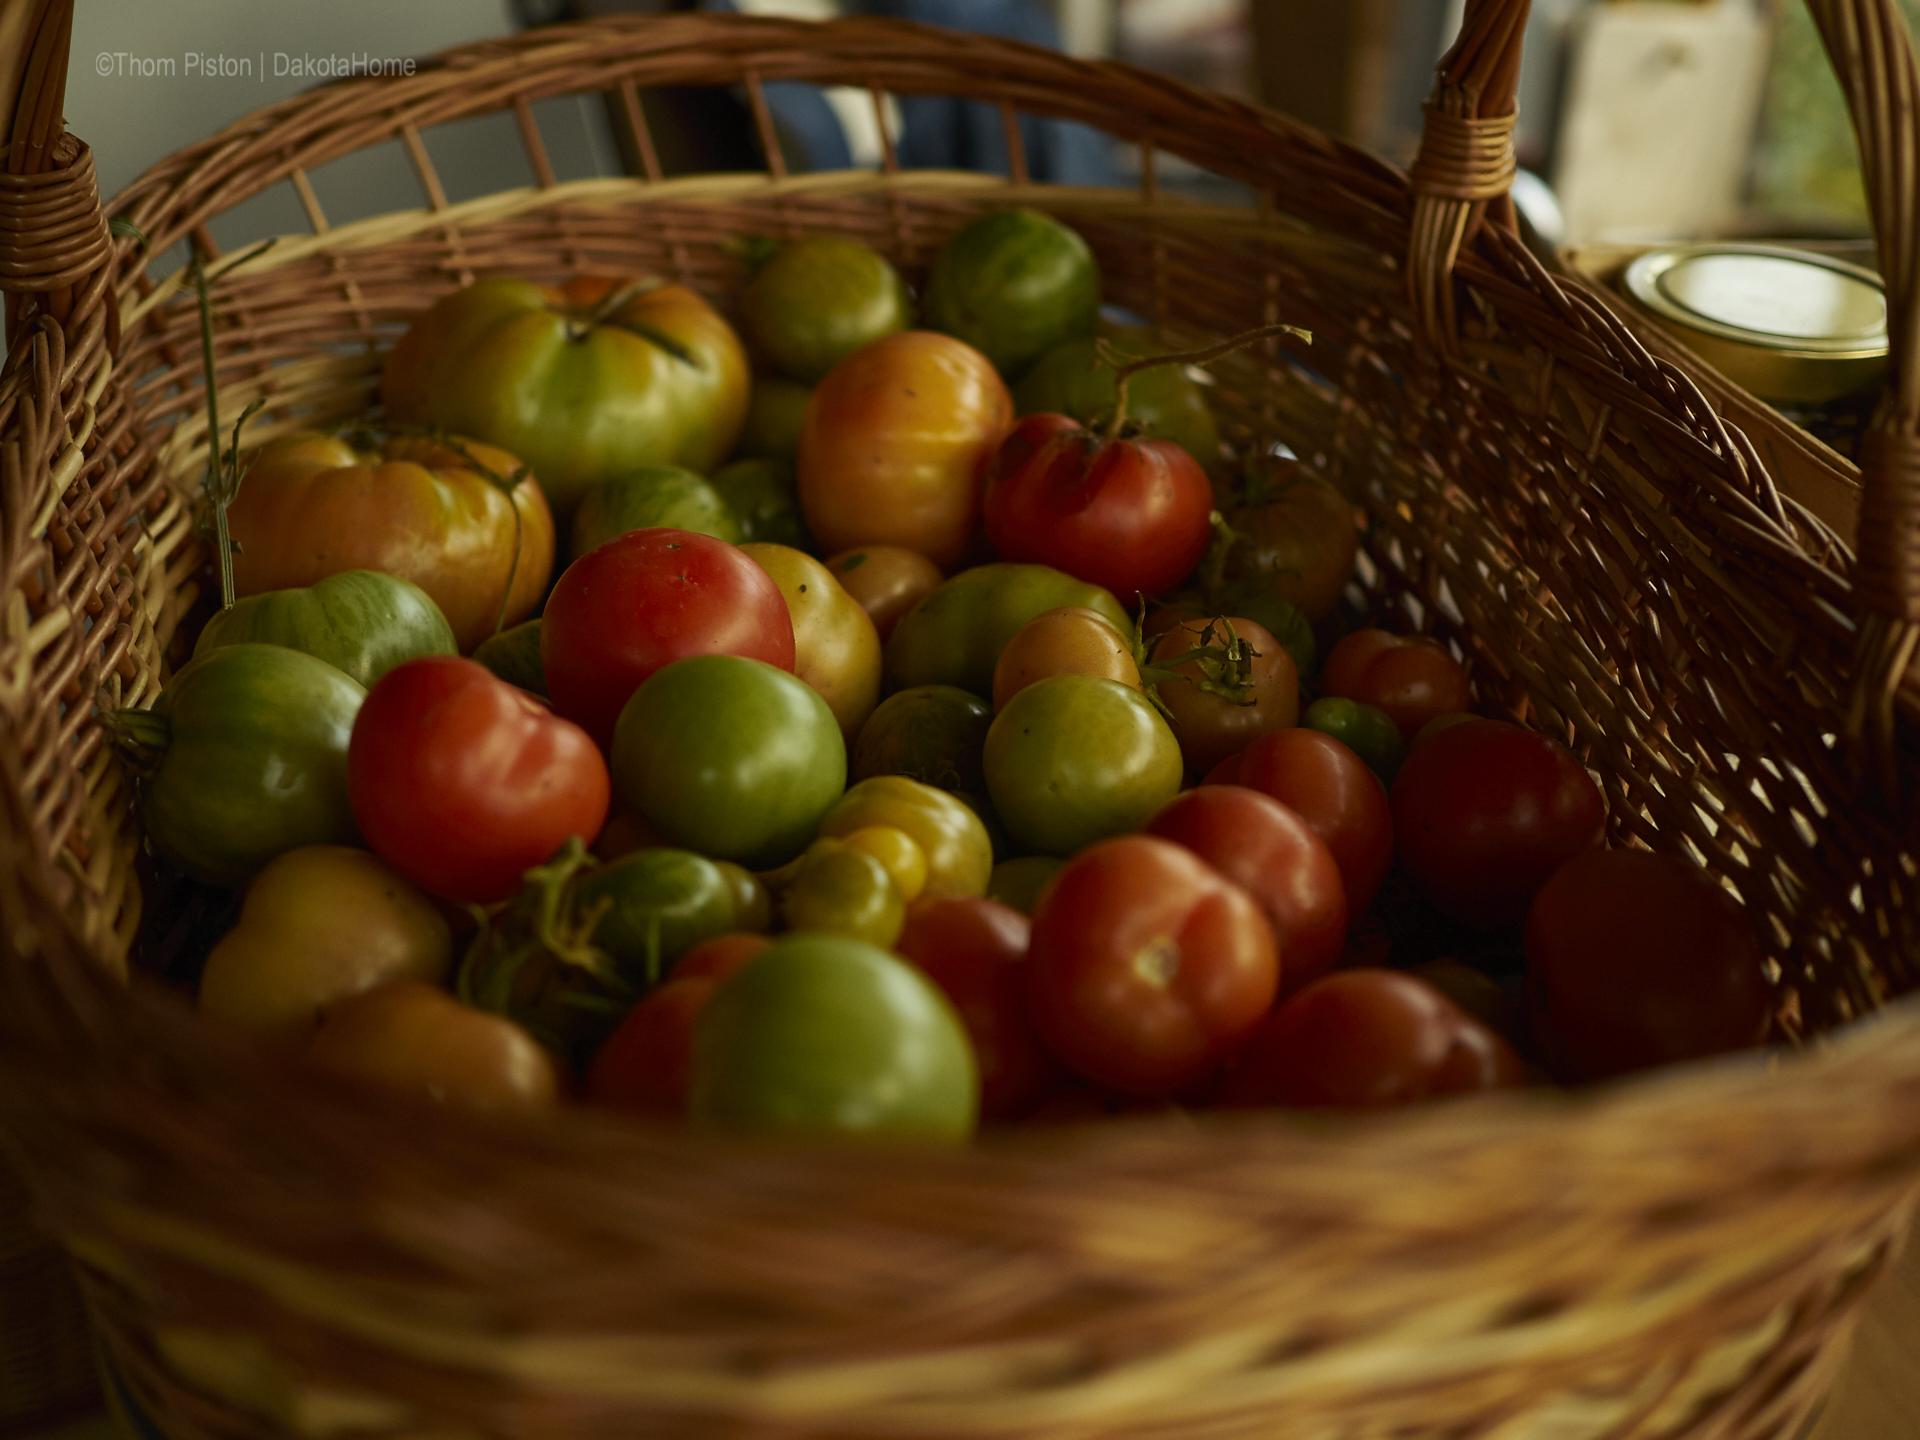 die letzten Tomaten at Dakota Home, 2018